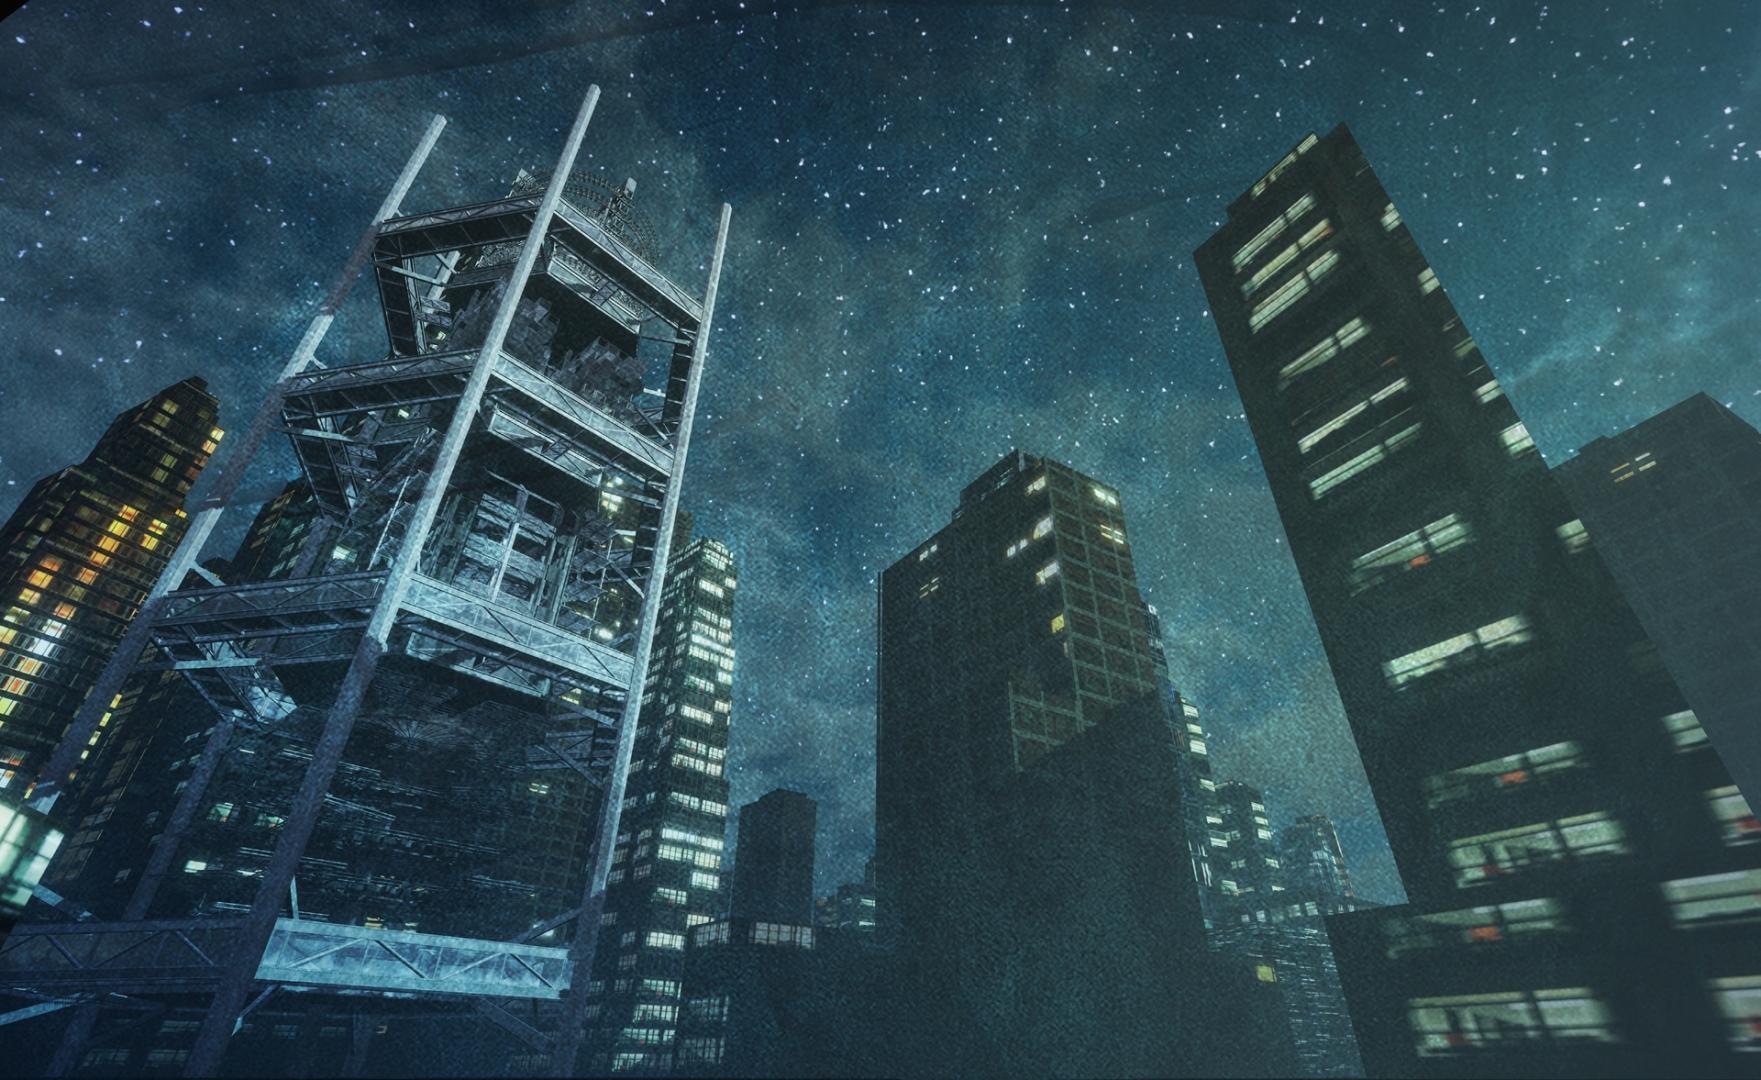 Enlarge Photo: Final render 01 combined